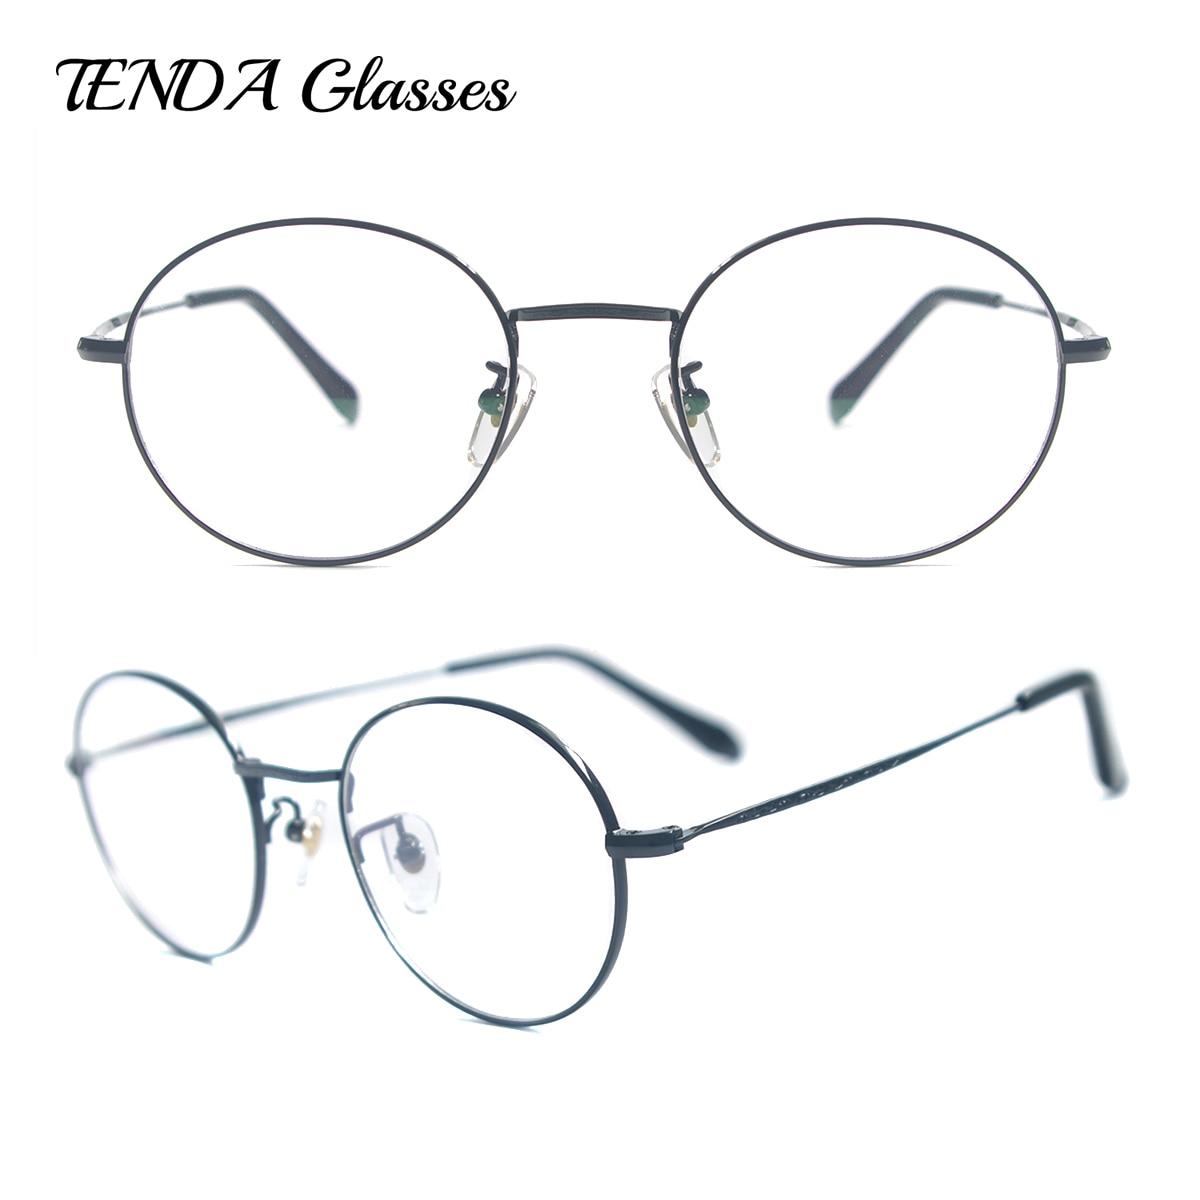 f0bc88b5b175 Men Ultra Light Pure Titanium Eyeglass Frames Vintage Eyewear Round Retro  Spectacles For Prescription Lenses-in Eyewear Frames from Apparel  Accessories on ...